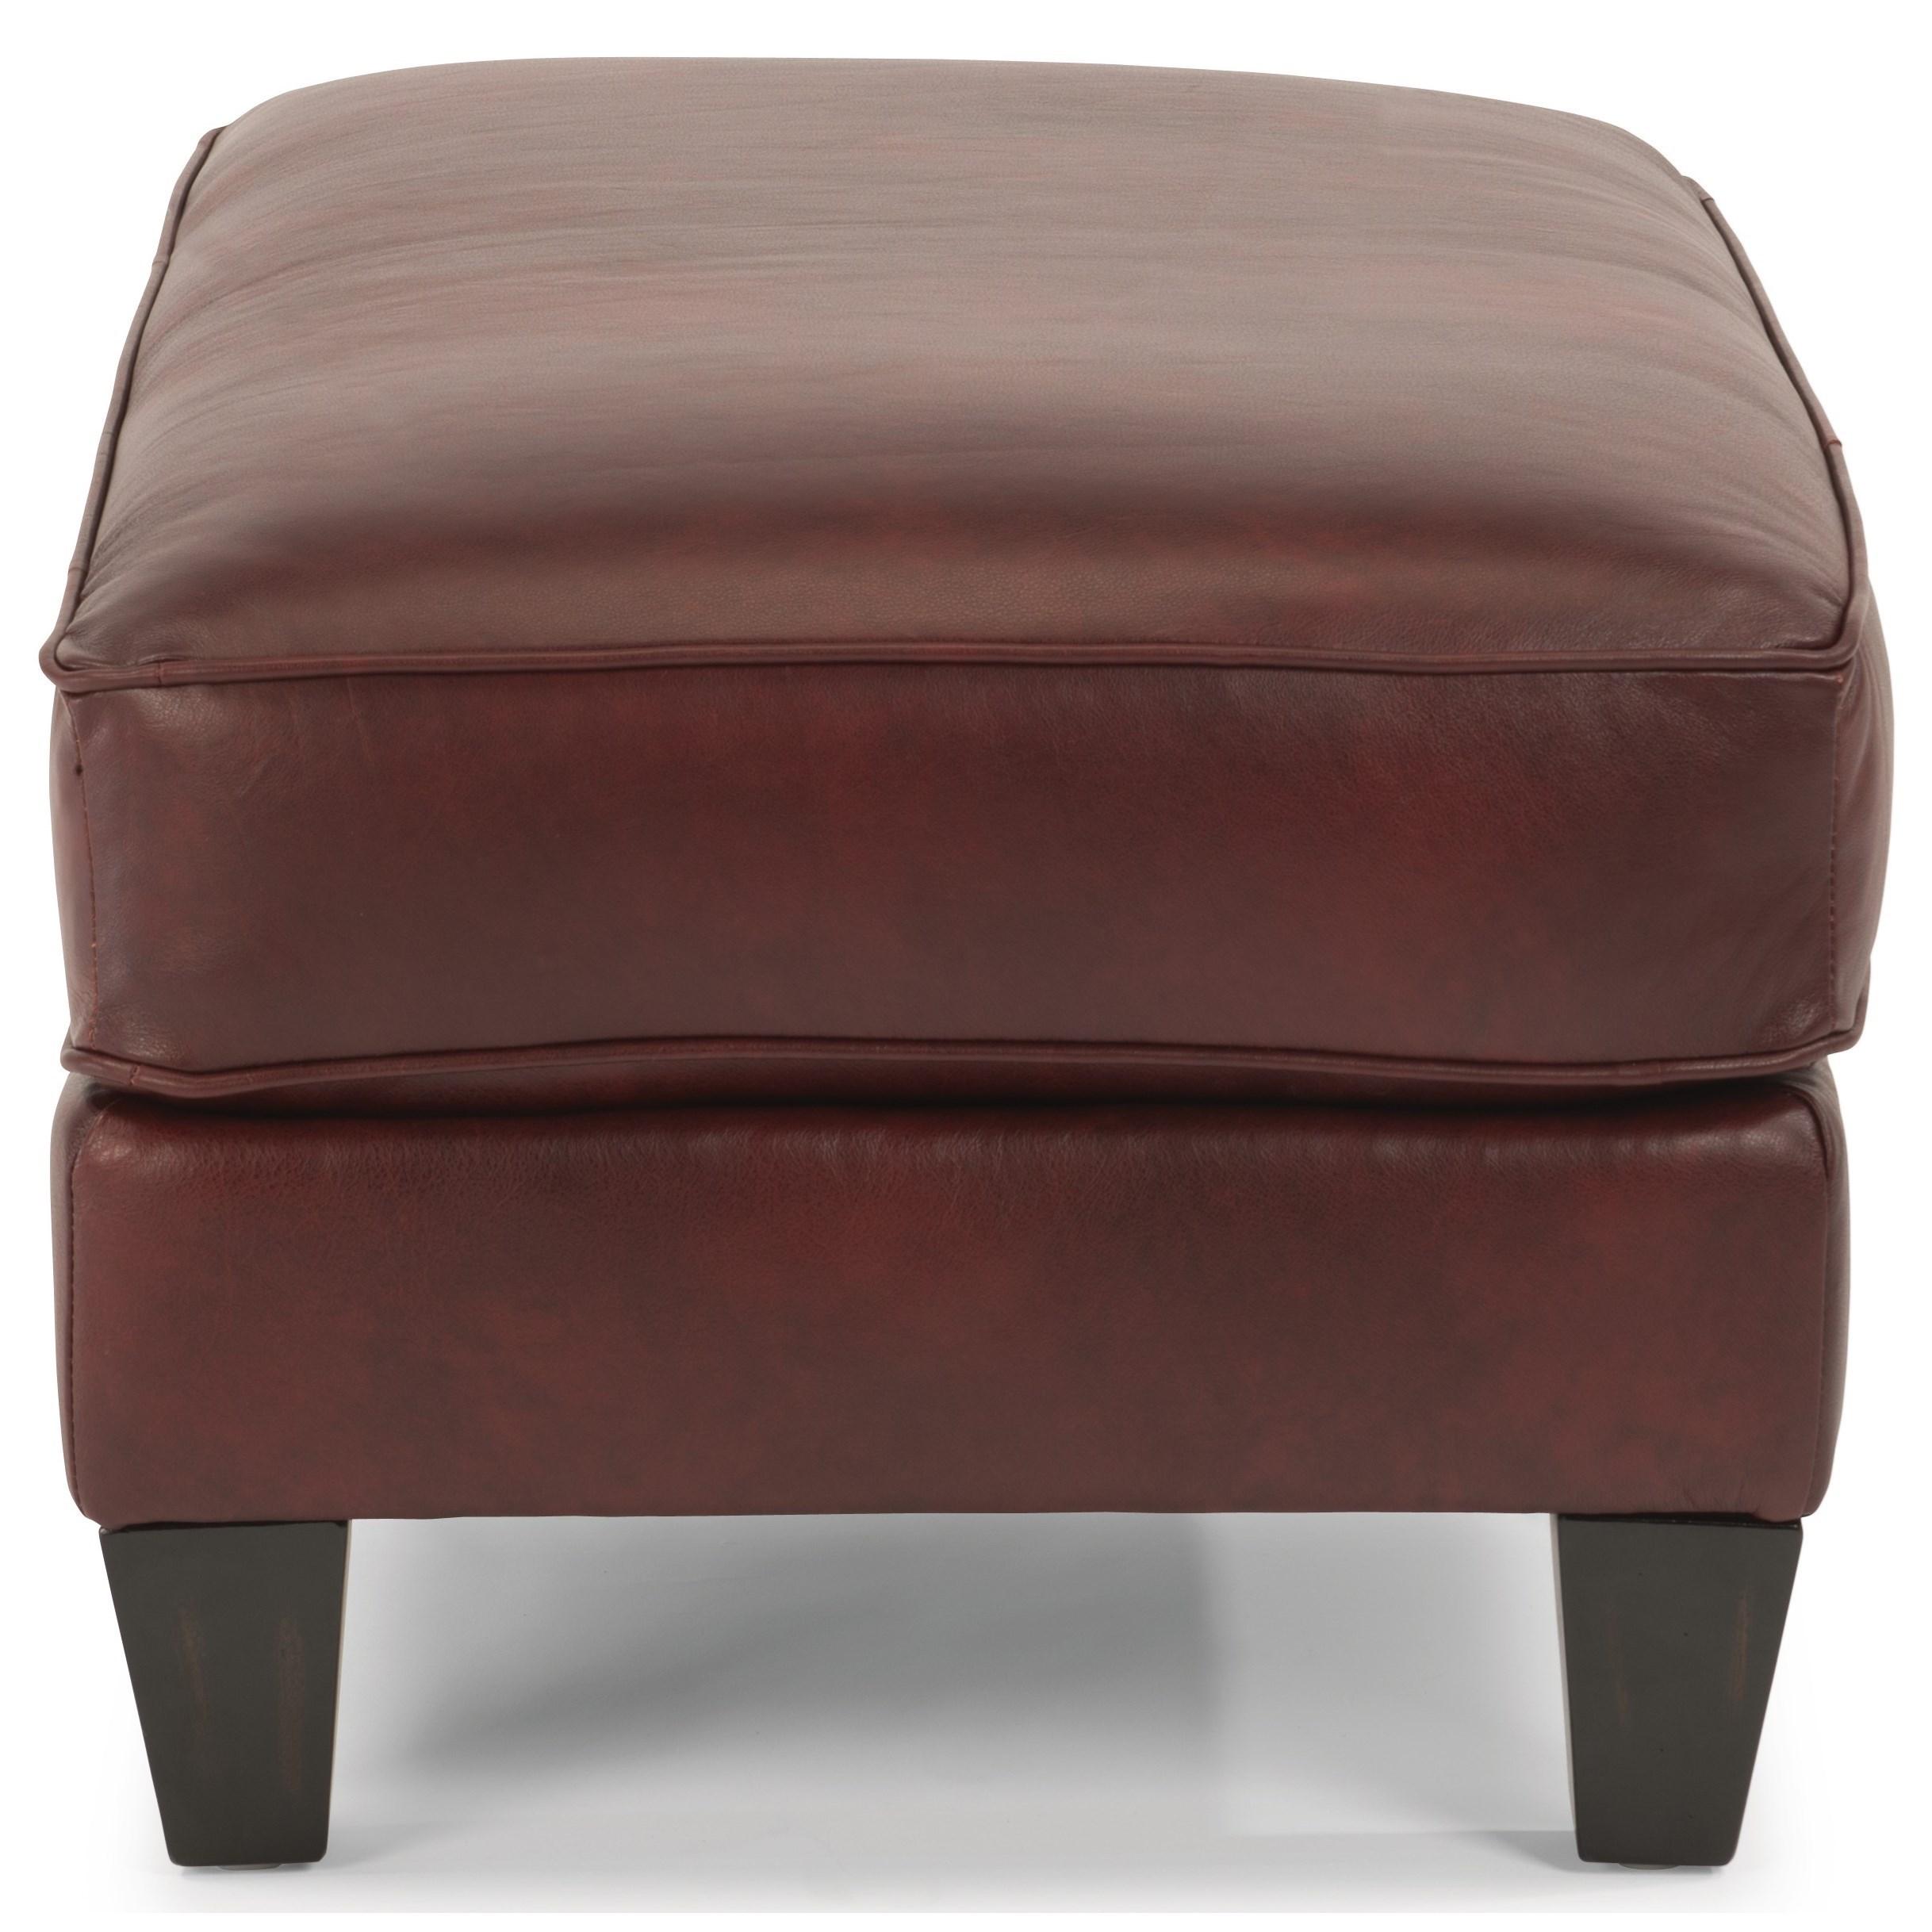 Flexsteel Westside Sofa Reviews: Flexsteel Westside Cocktail Ottoman With Tapered Legs